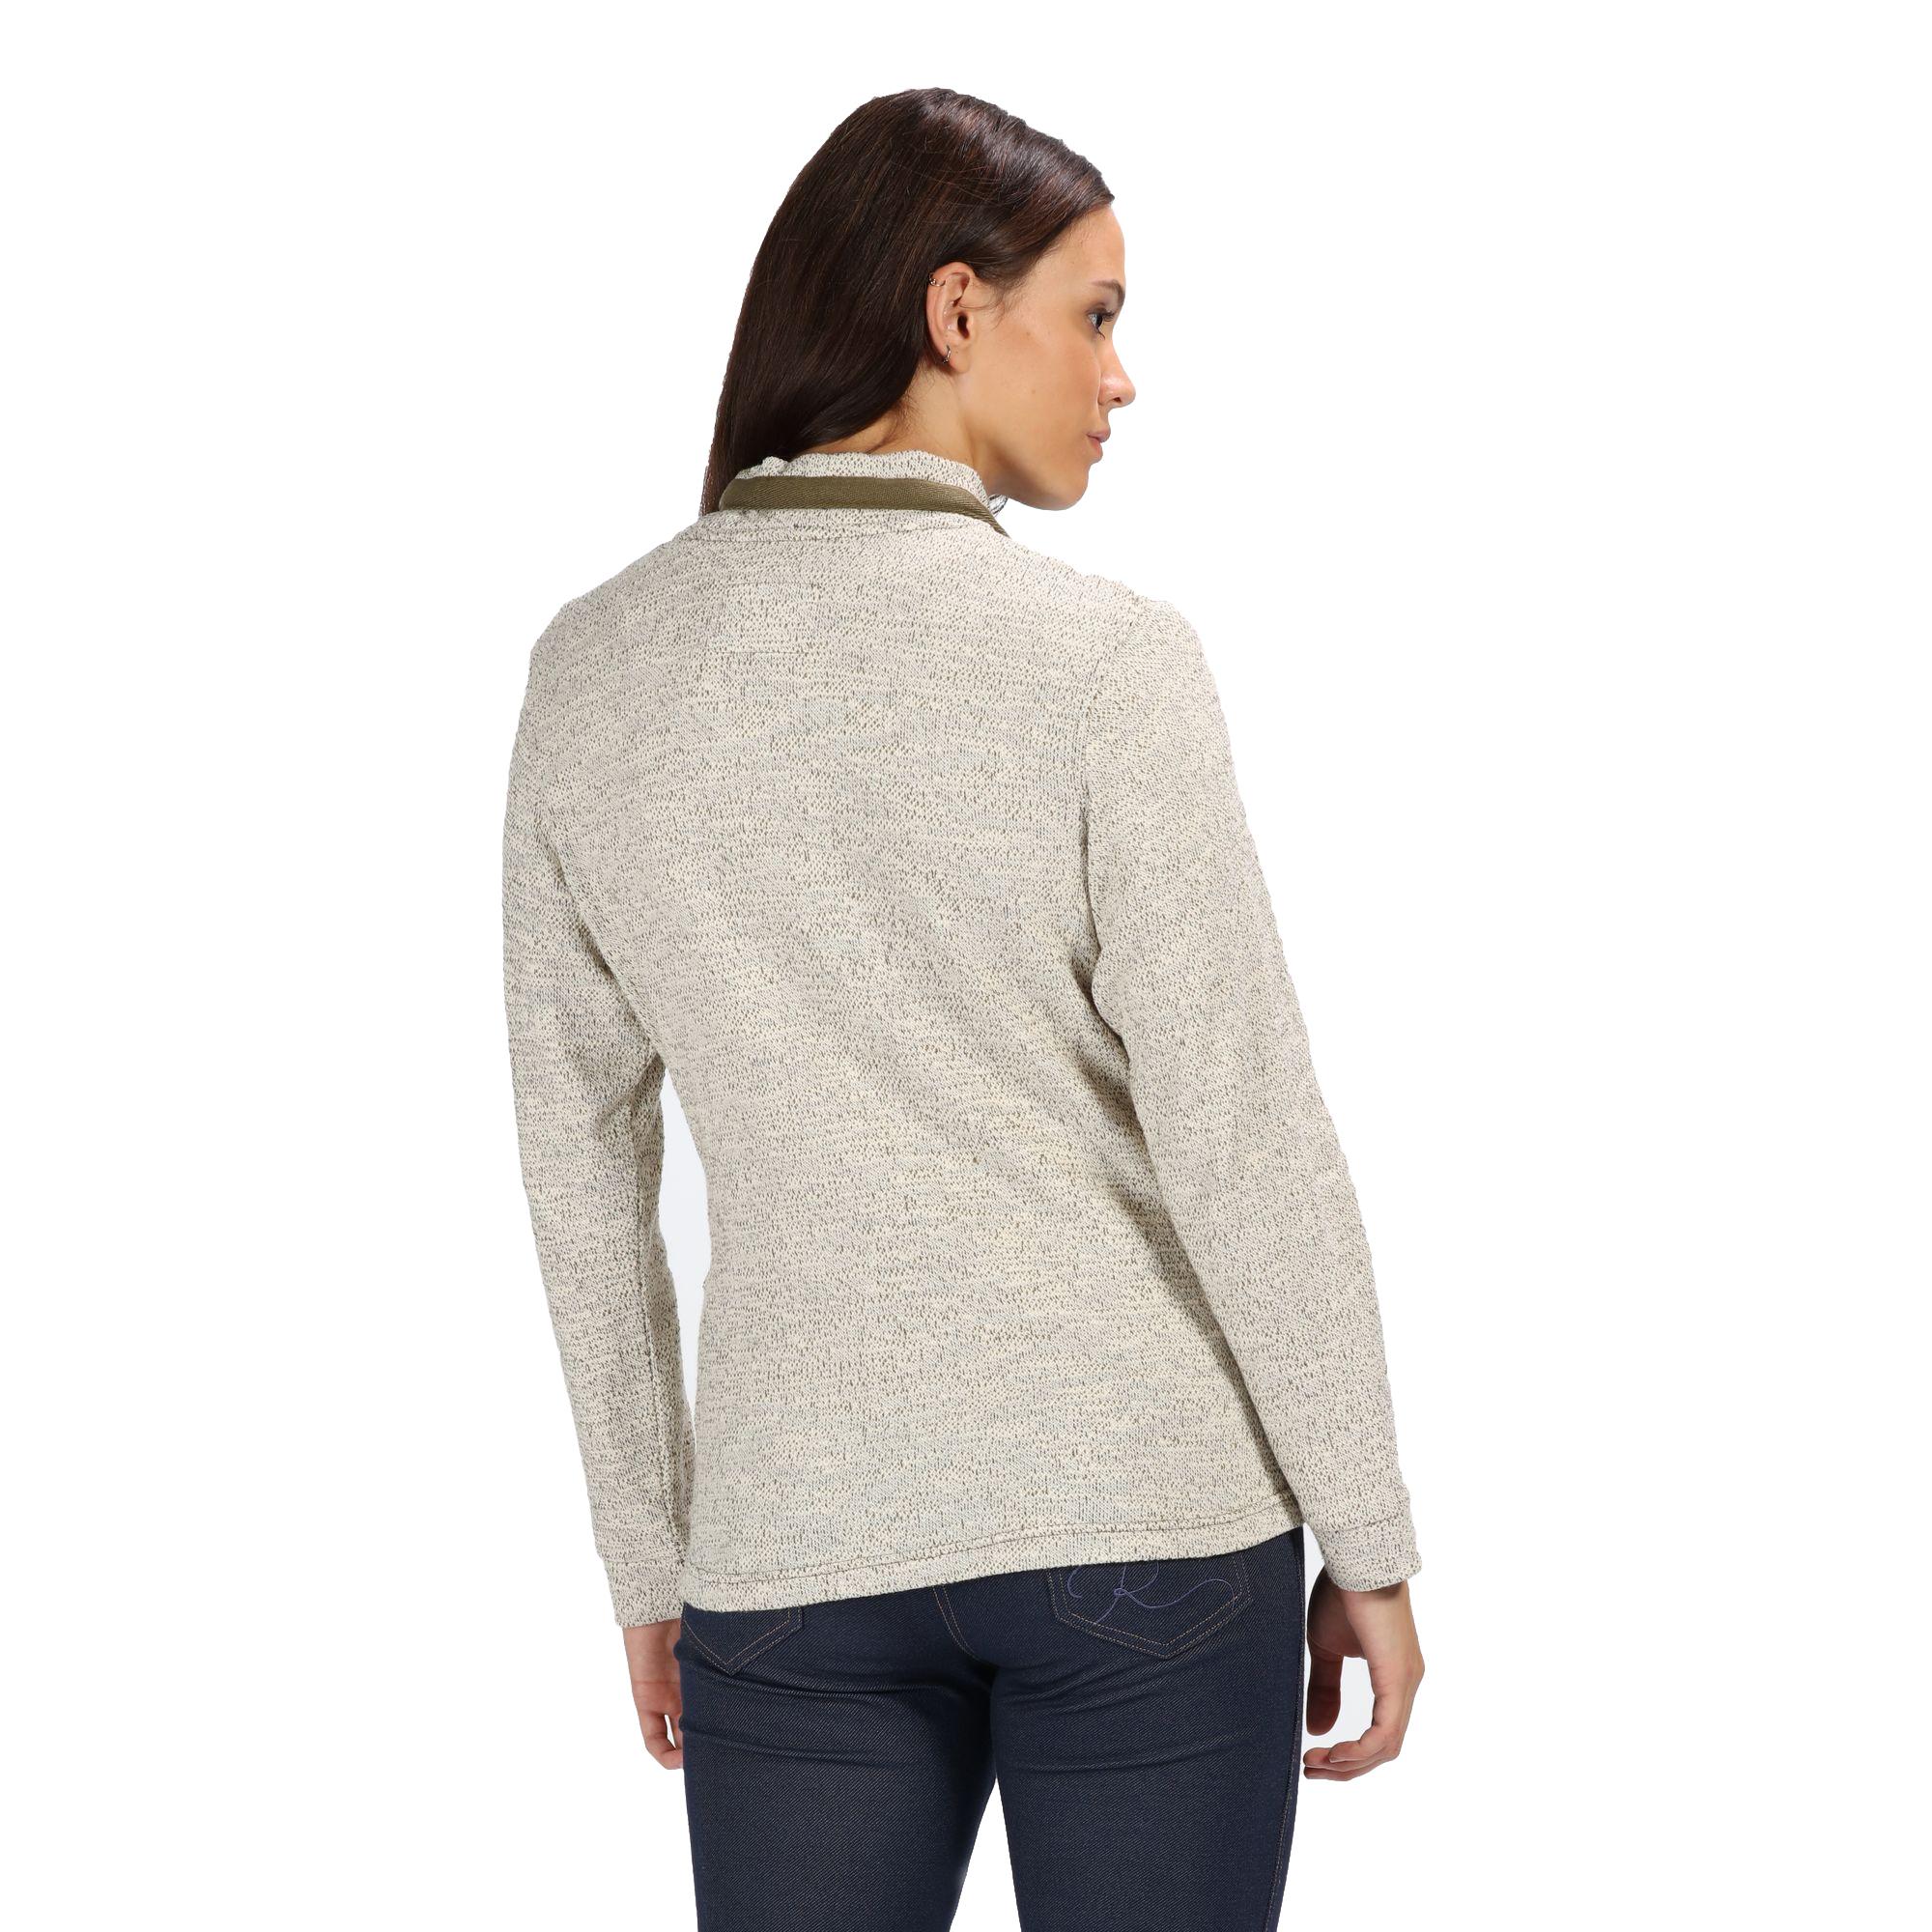 Regatta-Odetta-Womens-Warm-Curved-Full-Zip-Fleece-Jacket-RRP-50 thumbnail 7